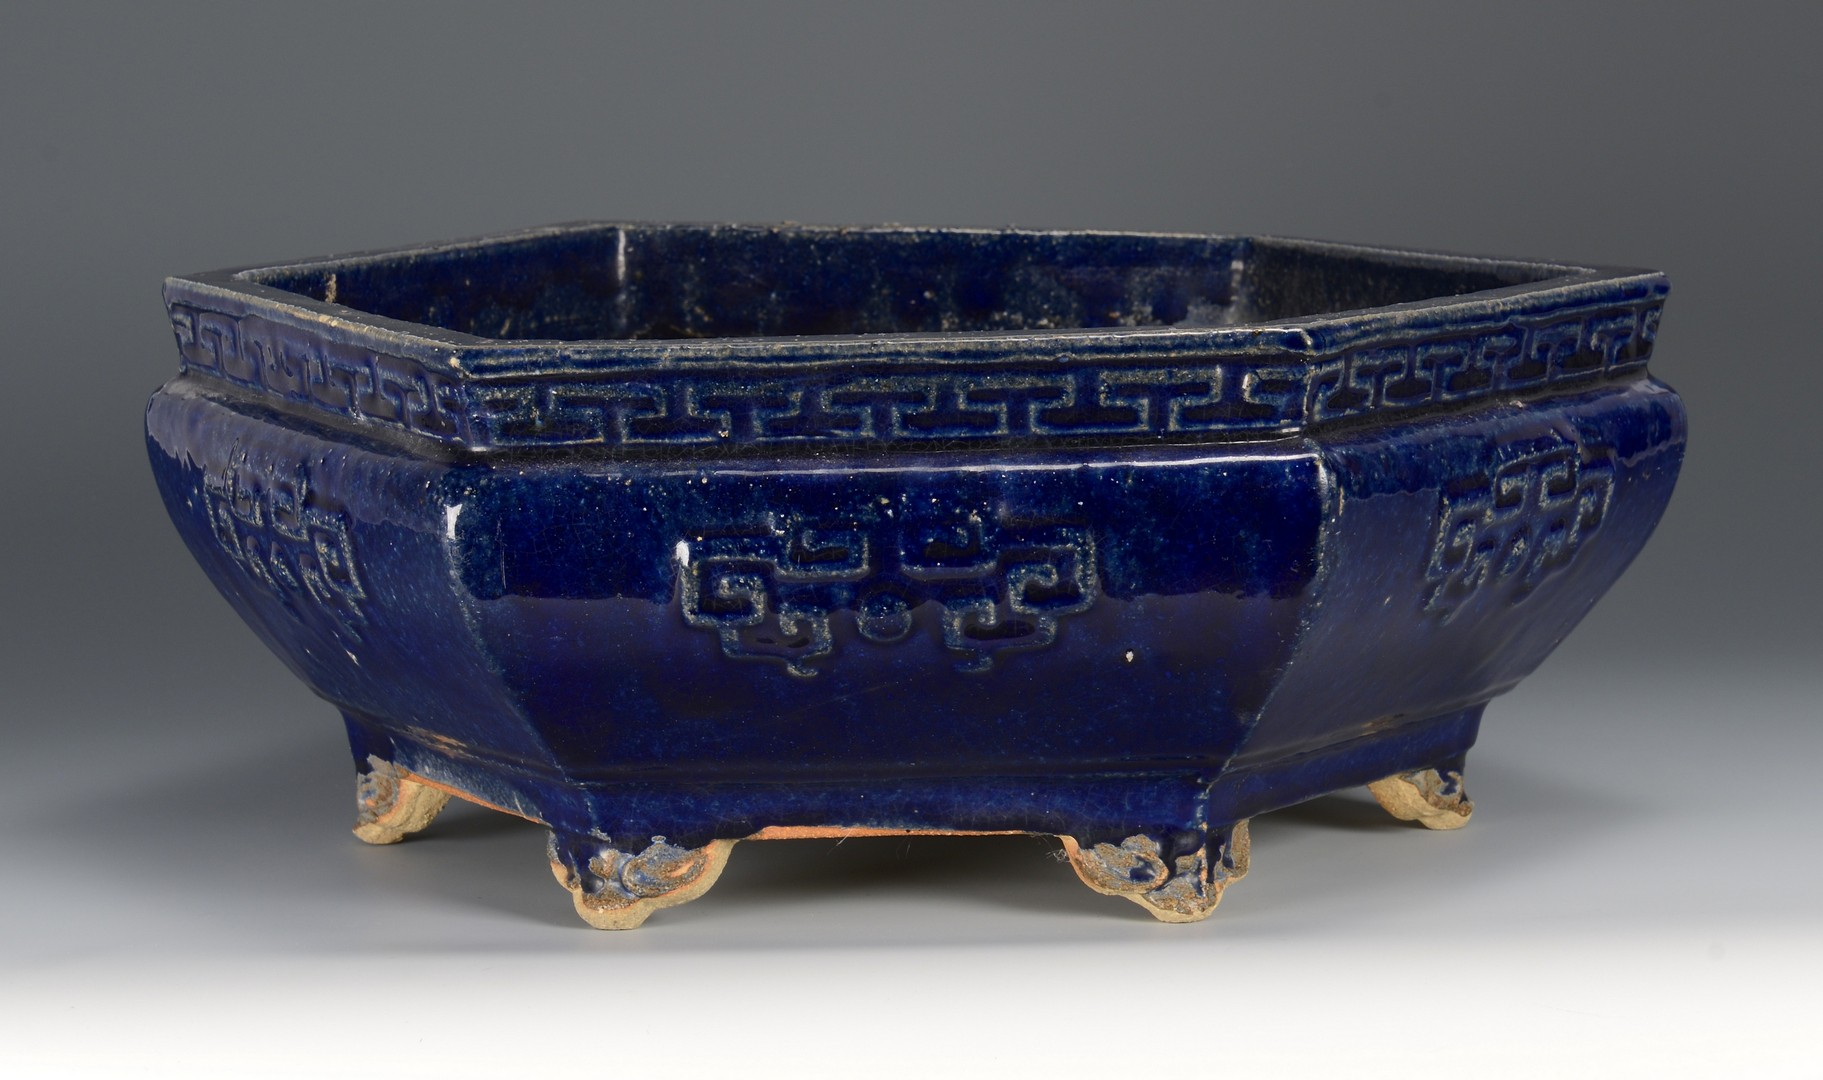 Lot 3594165: Large Chinese Cobalt Glaze Bulb Bowl